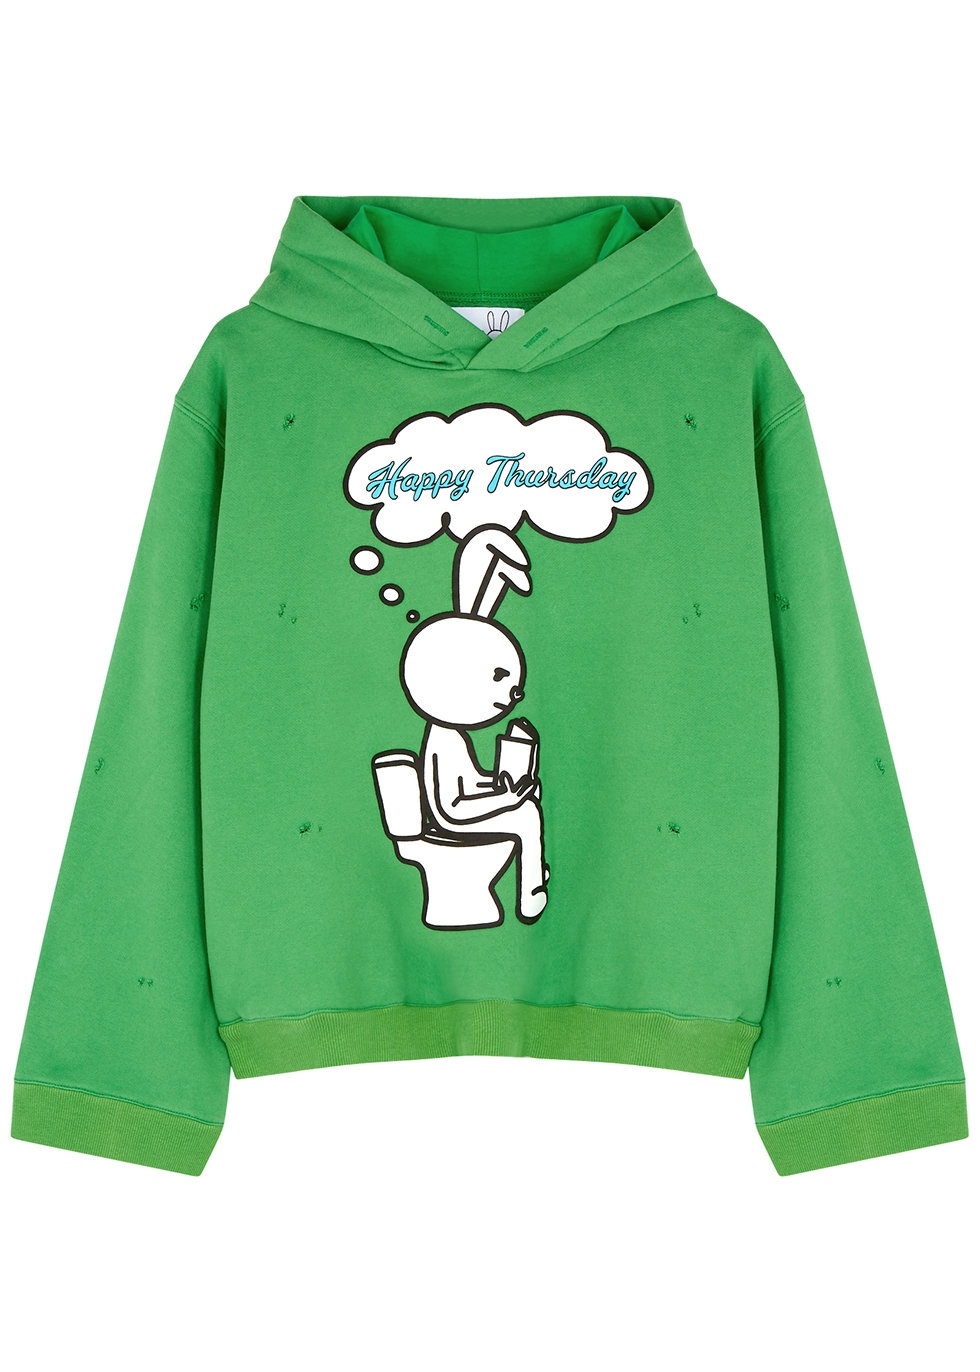 Happy Thursday hooded cotton-blend sweatshirt